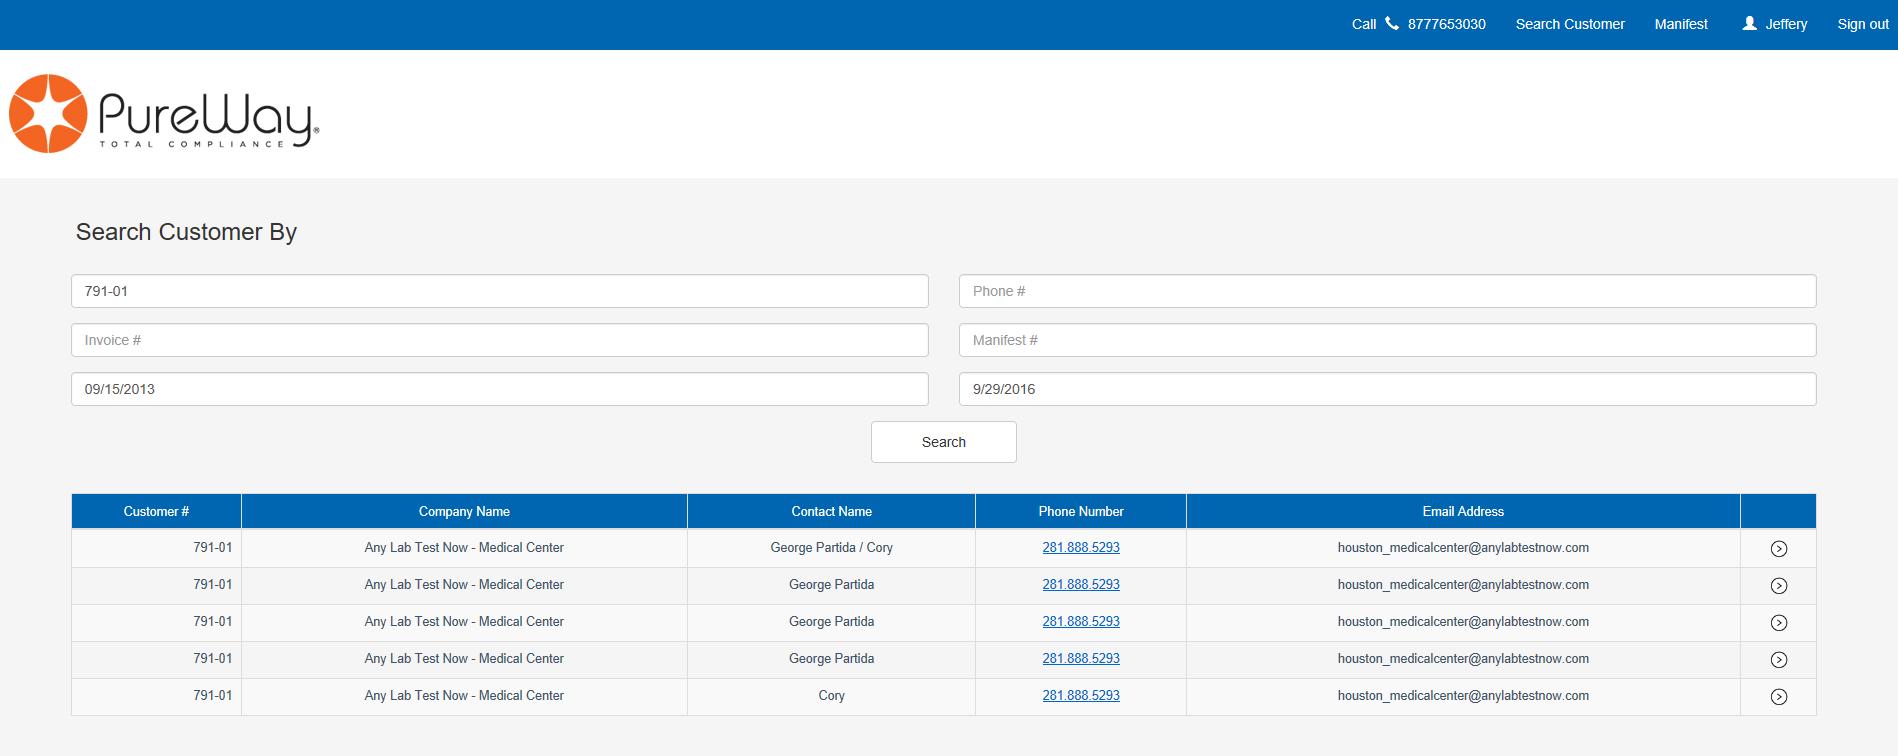 PureWay Online Tracking Documents